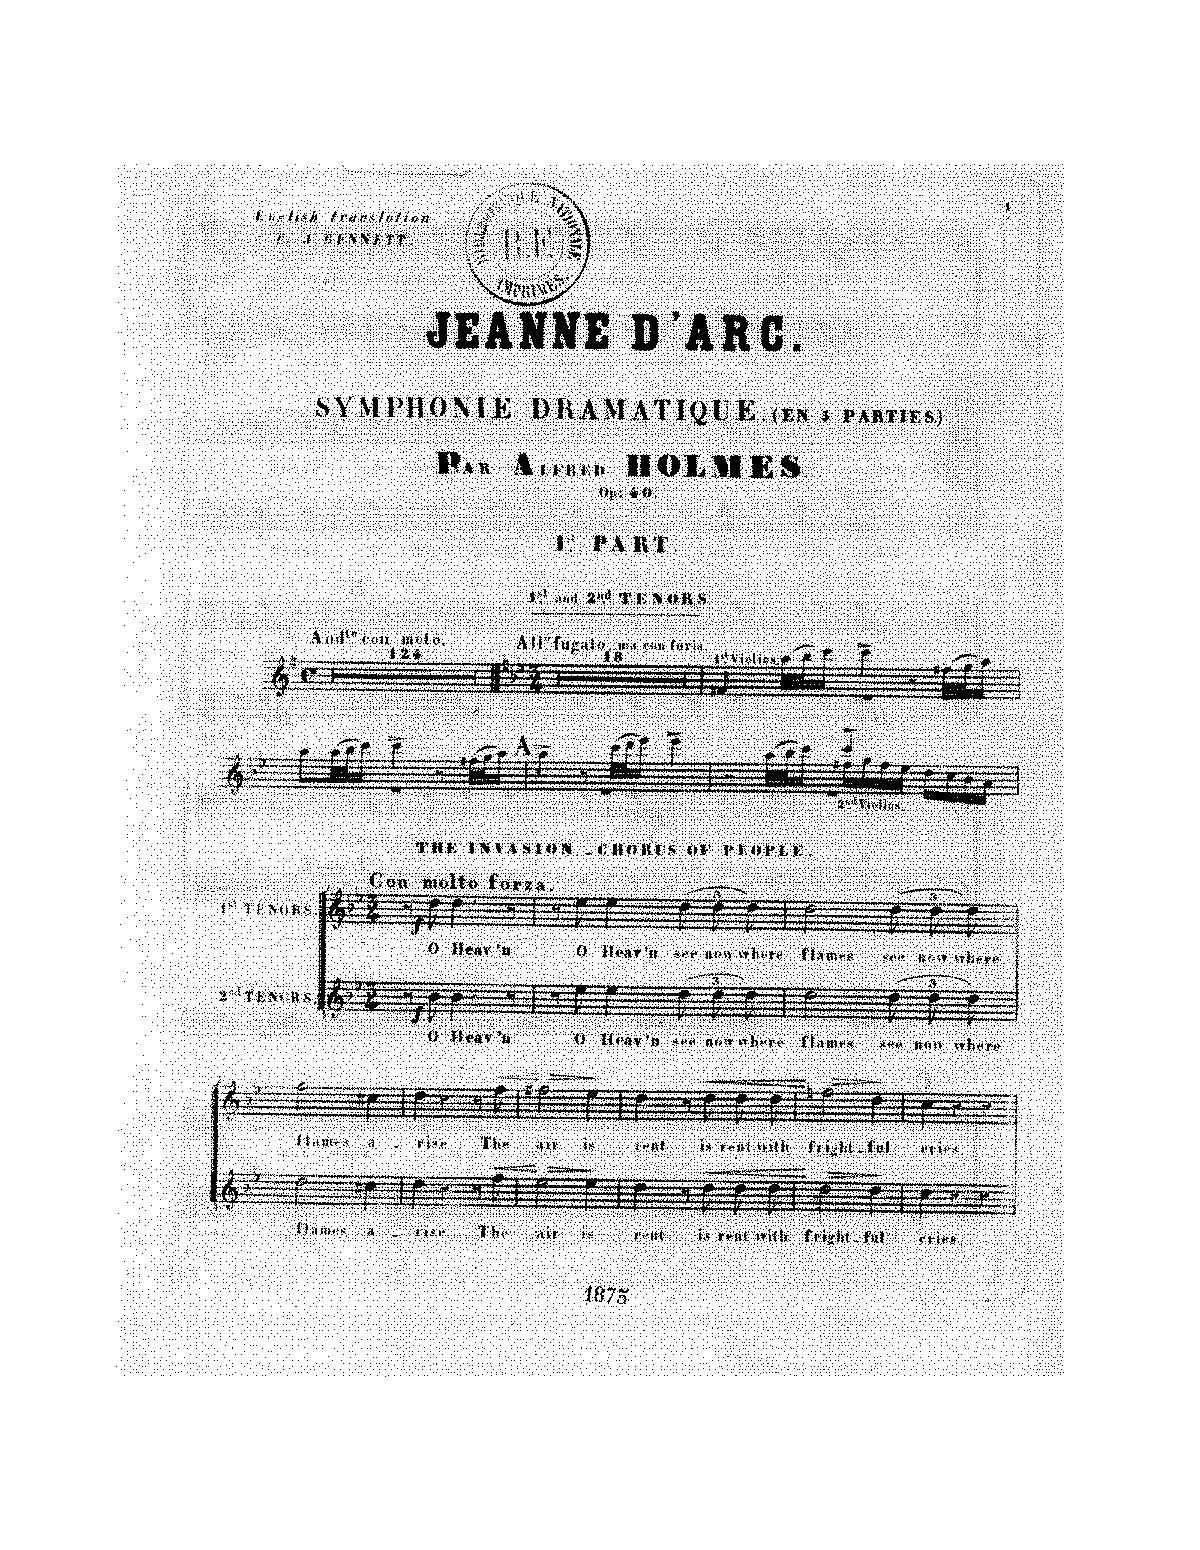 Jeanne d'Arc Symphony, Op 40 (Holmes, Alfred) - IMSLP/Petrucci Music